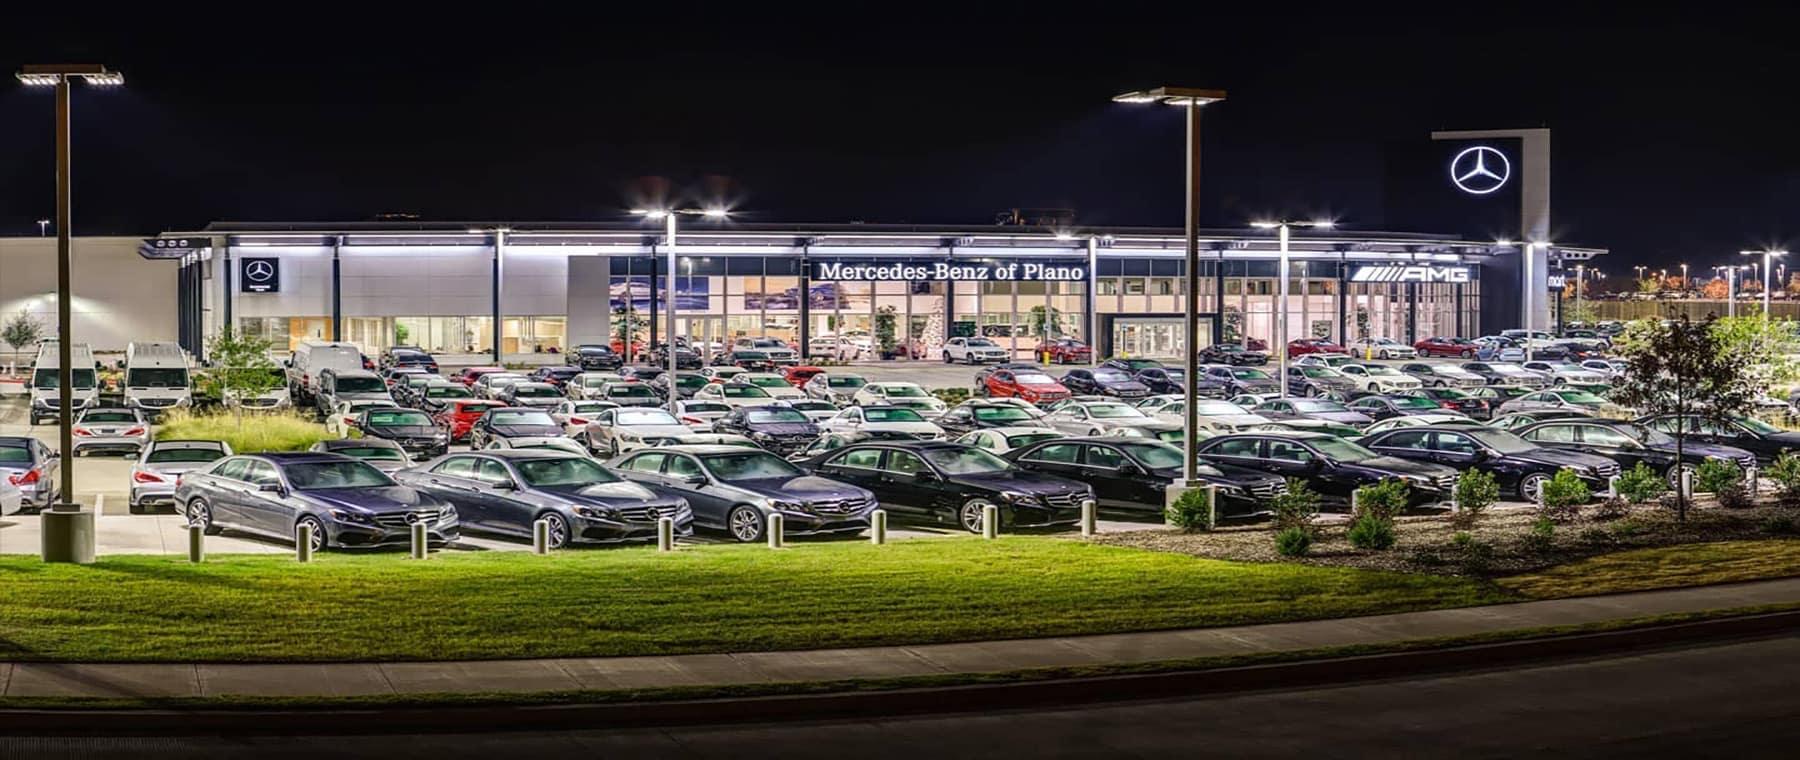 Mercedes Benz Of Plano Luxury Auto Dealership Near Frisco